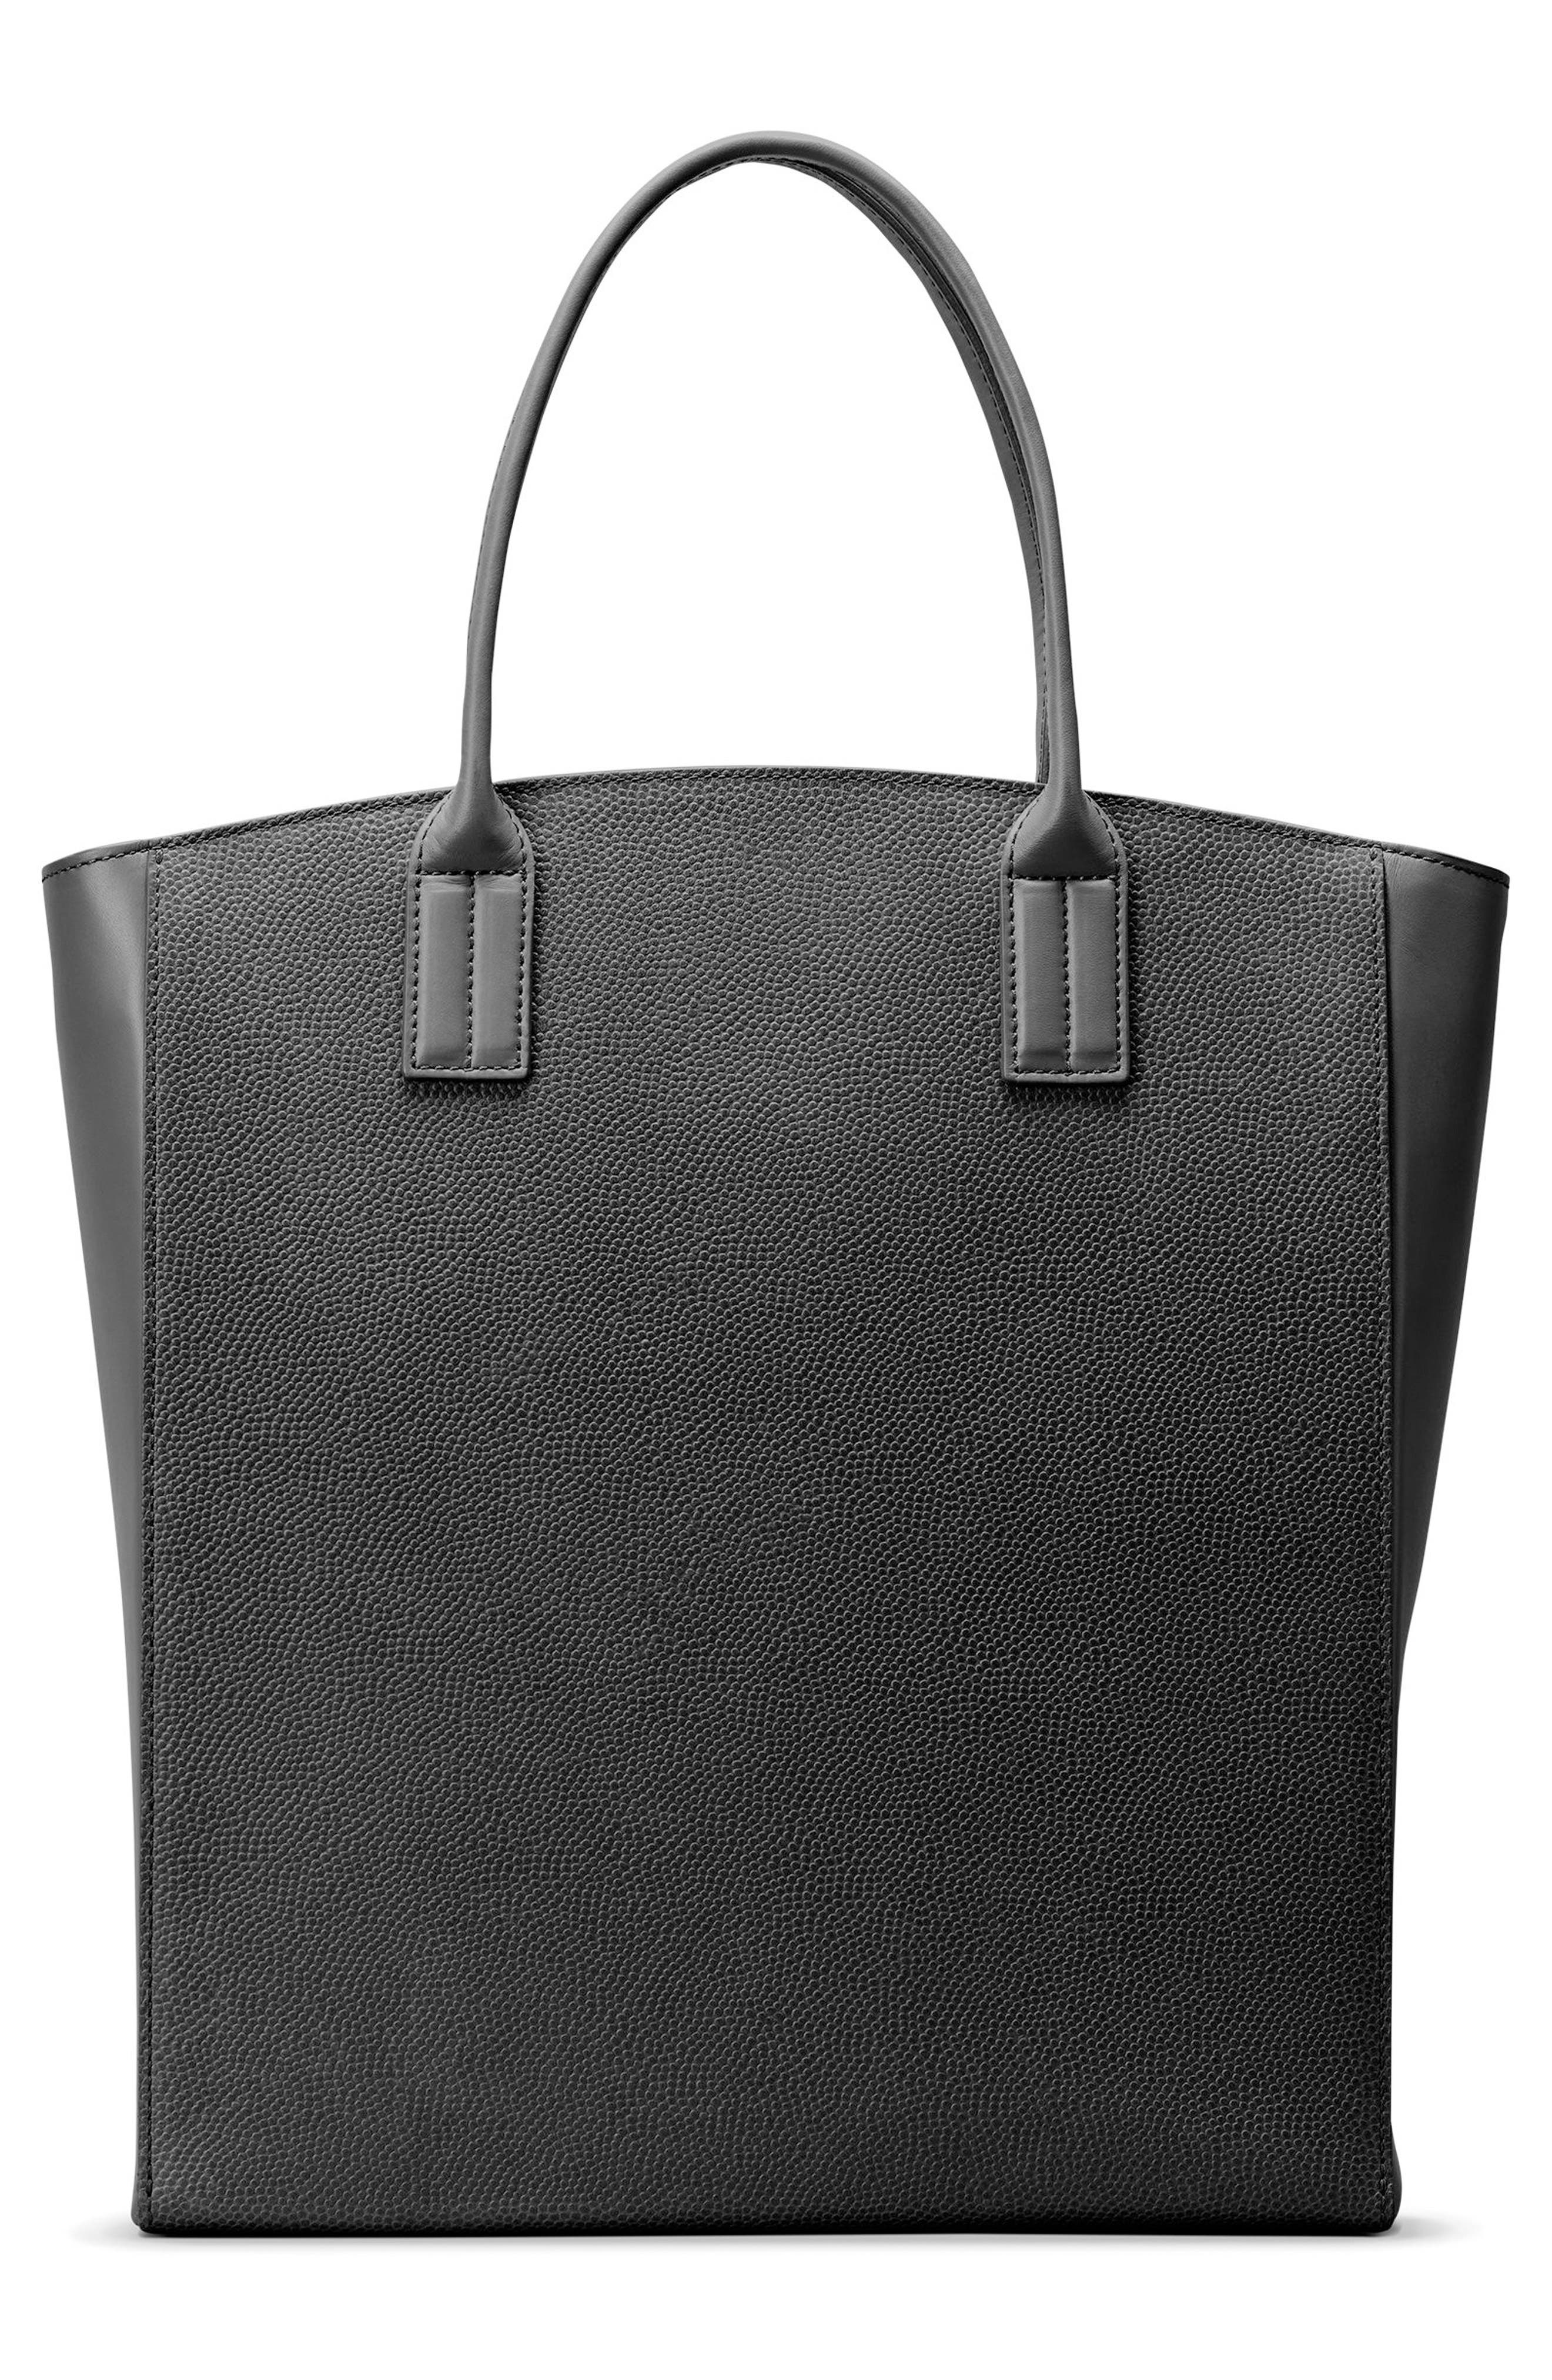 Latigo Leather Tote,                             Alternate thumbnail 2, color,                             Black